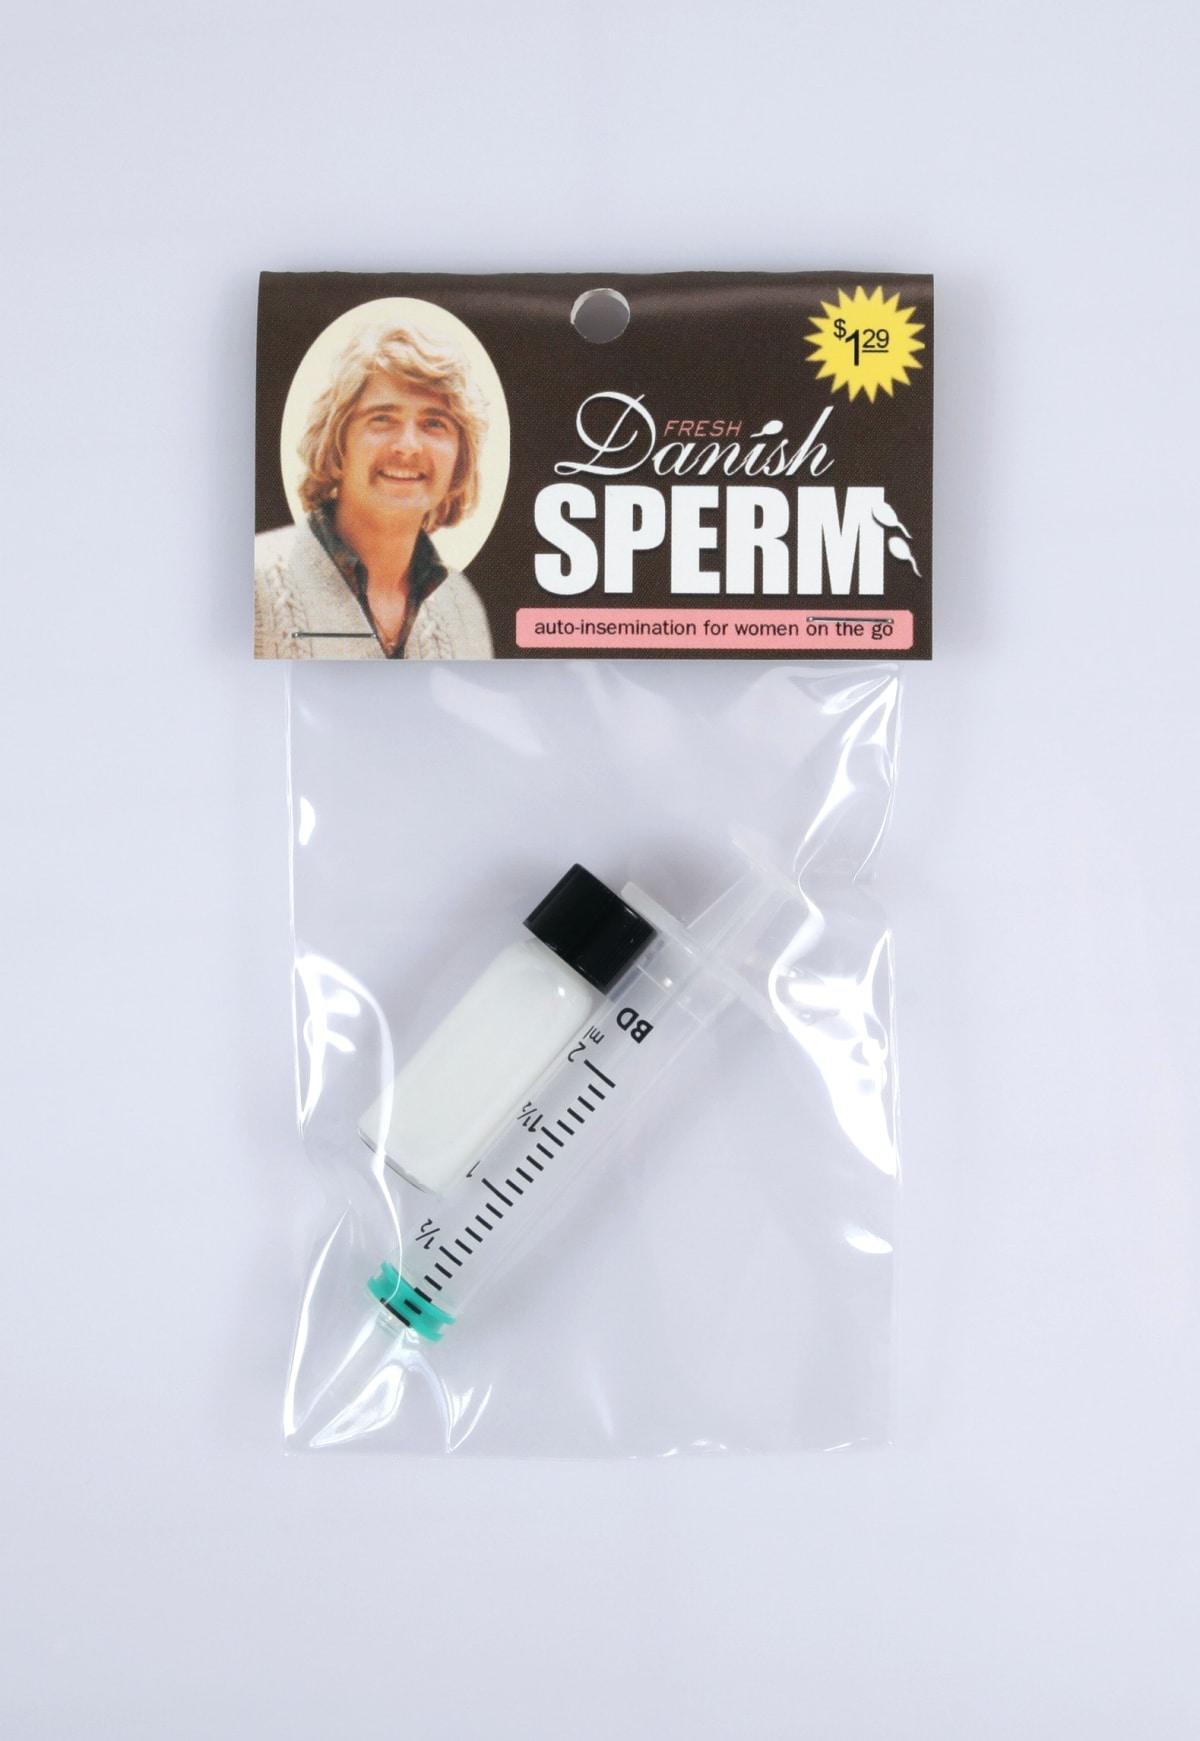 Danish sperm, 2003